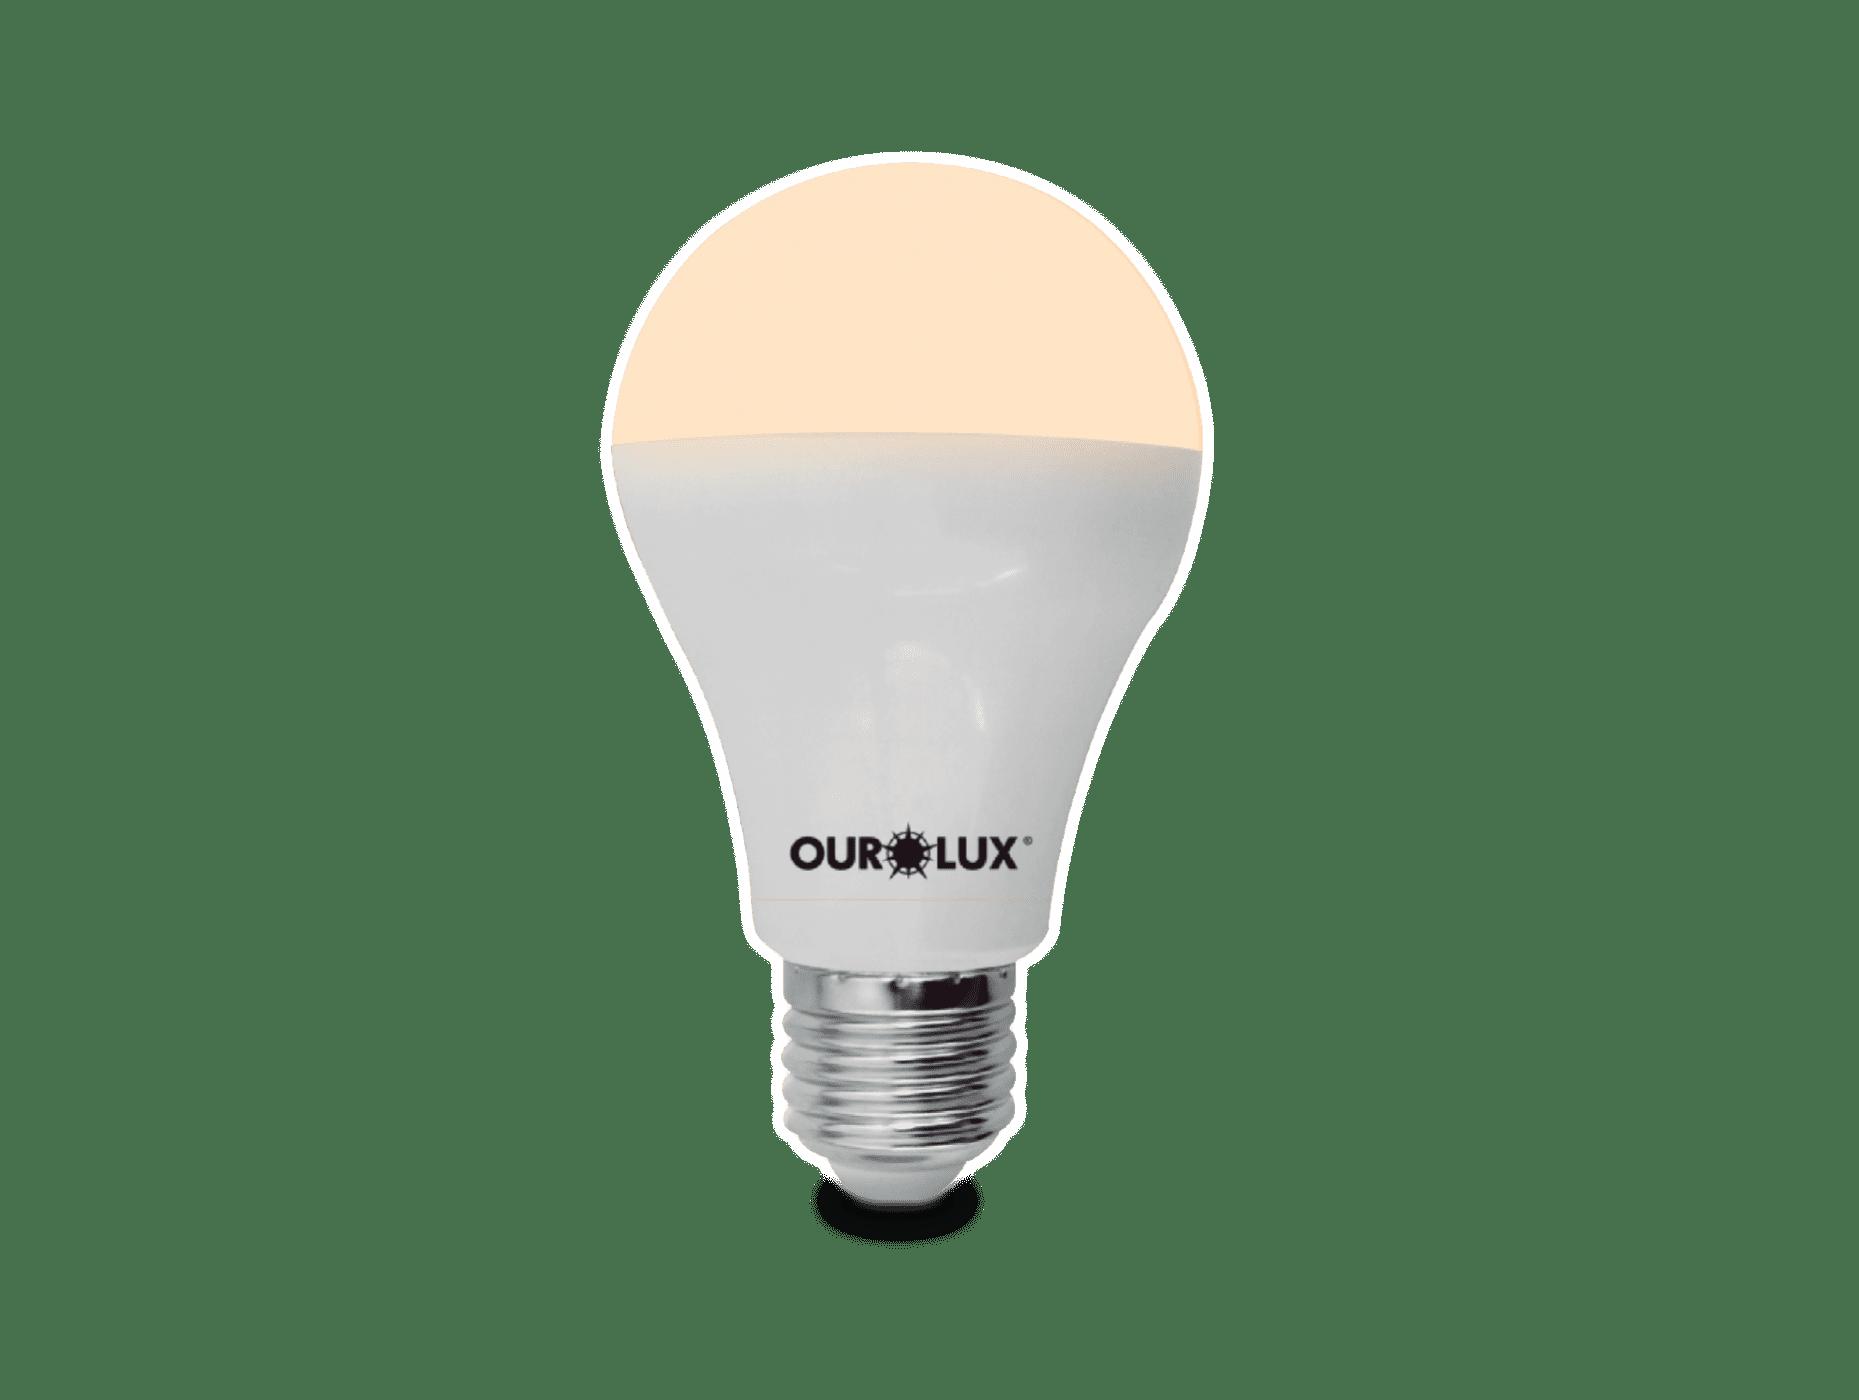 Lâmpada Ourolux Superled 12W Bivolt Branca  - Casa Mattos